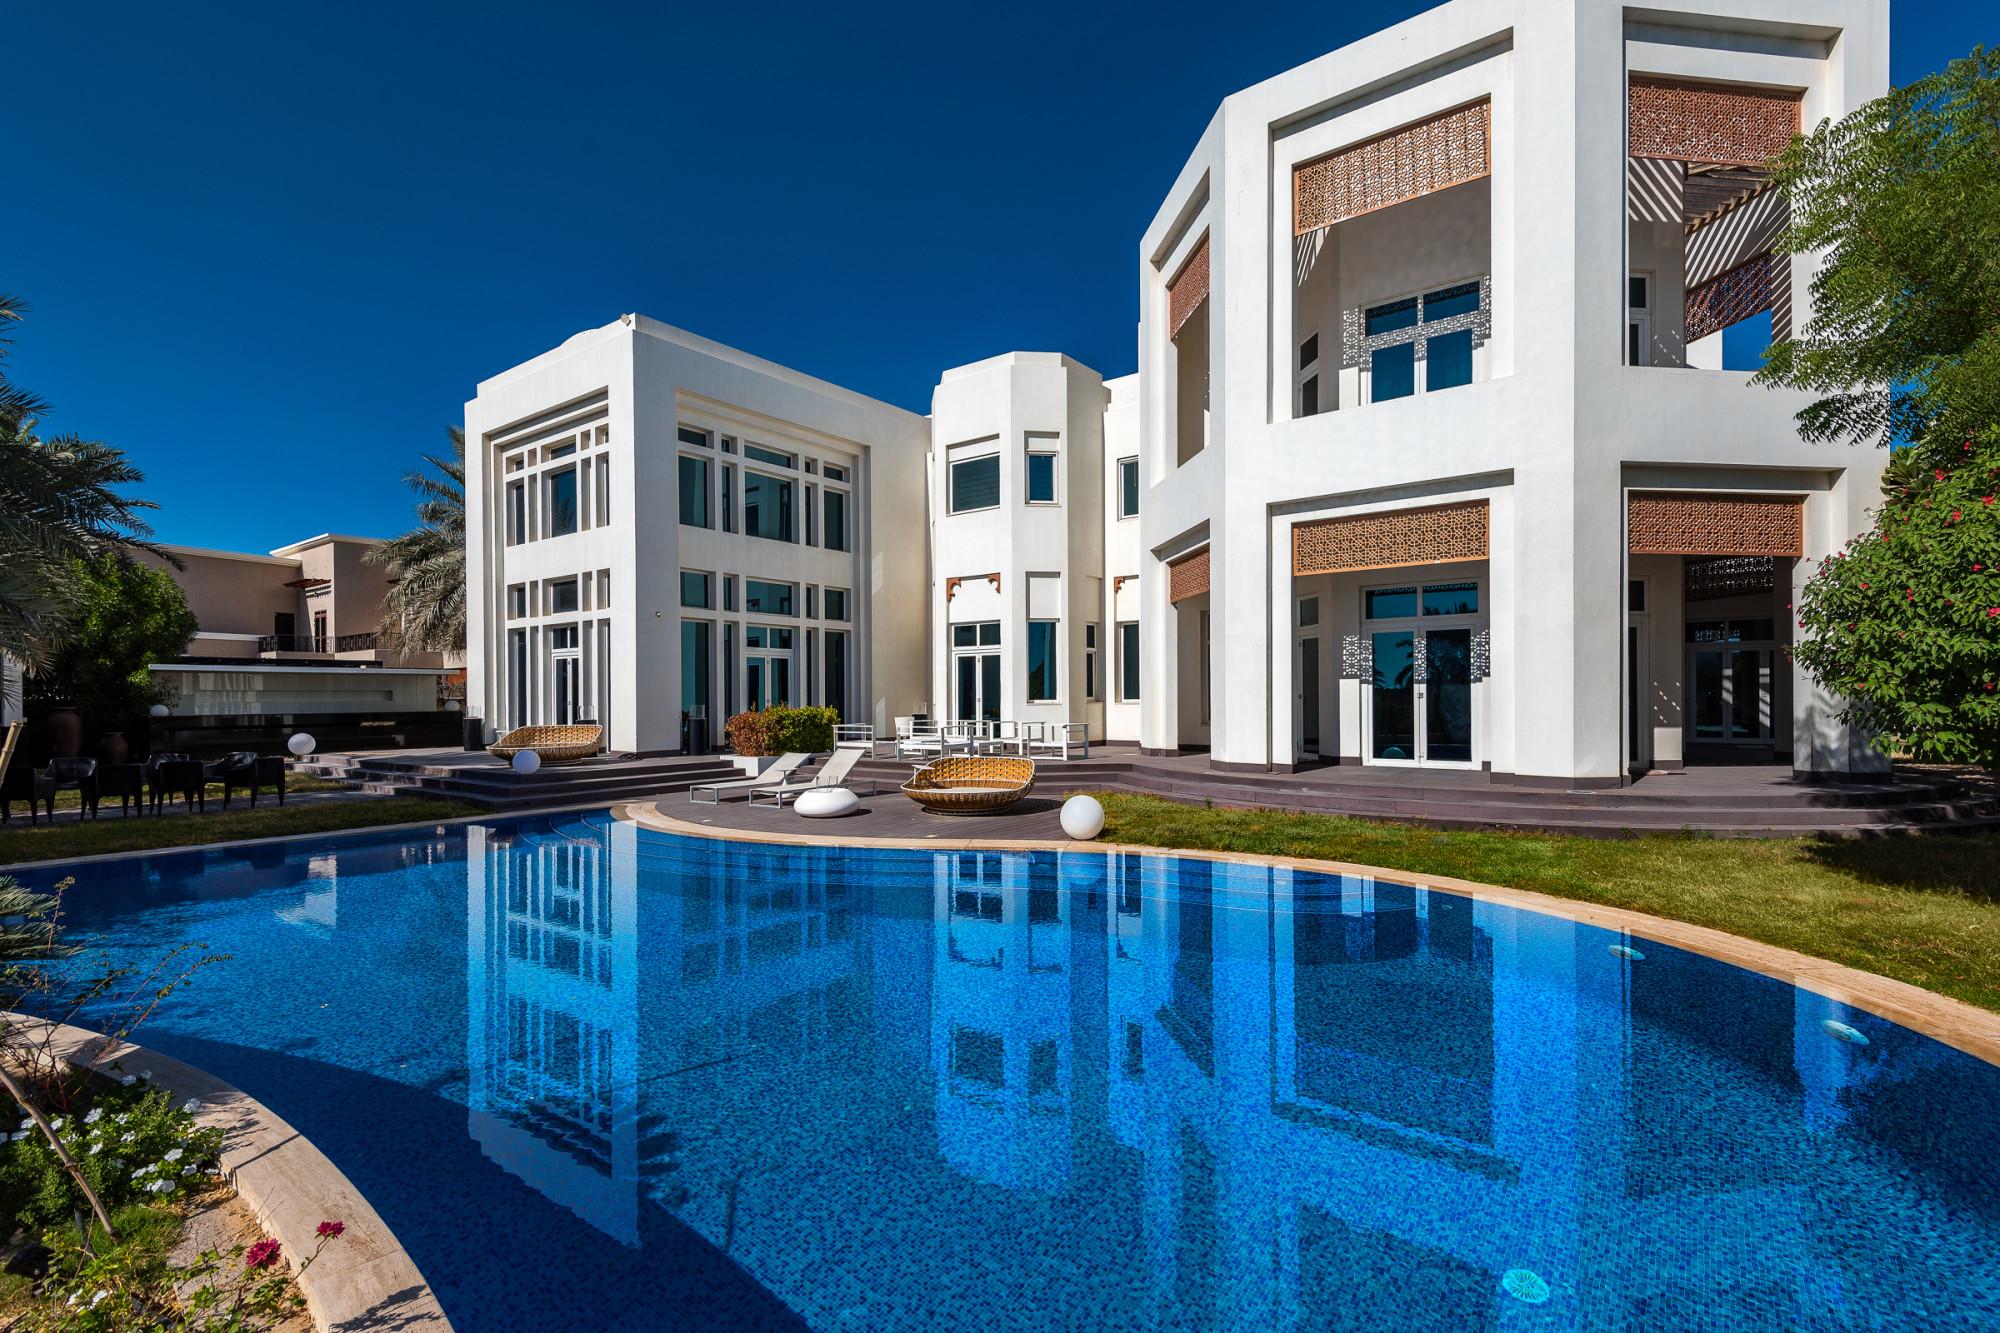 Luxury Villa 7 Bedroom | Golf and Lake Views